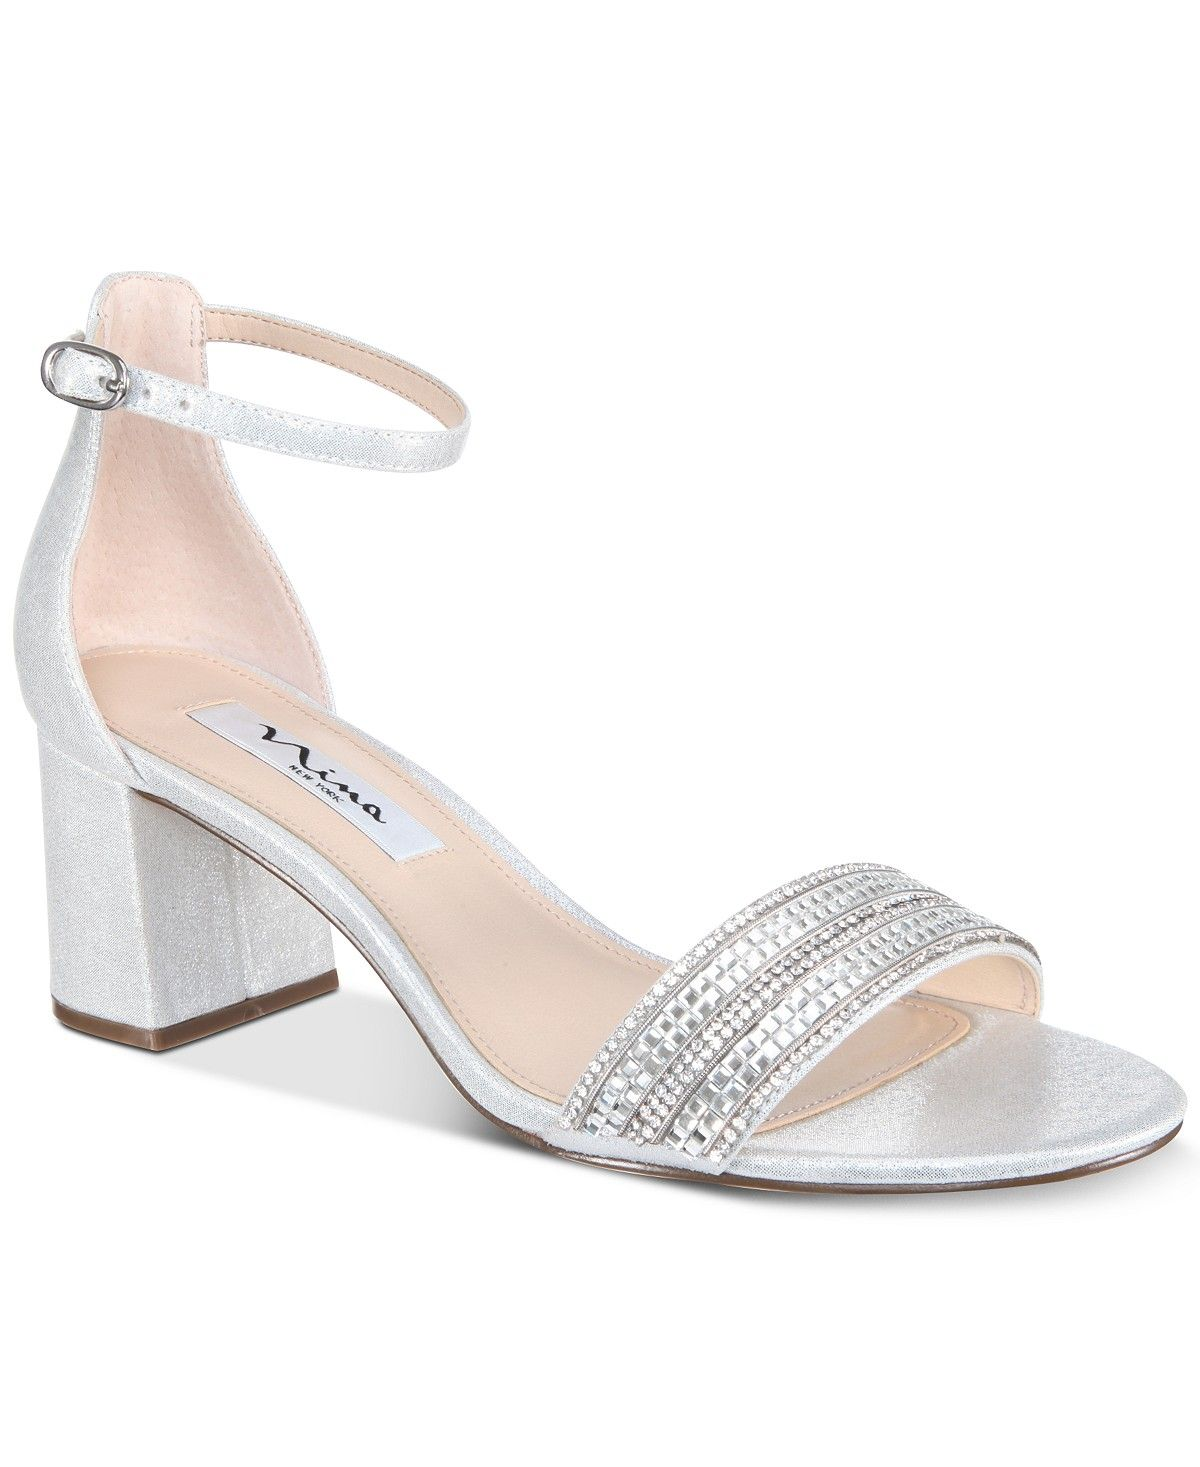 560ac158fef6 Nina Elenora Pumps - Evening   Wedding - Shoes - Macy s